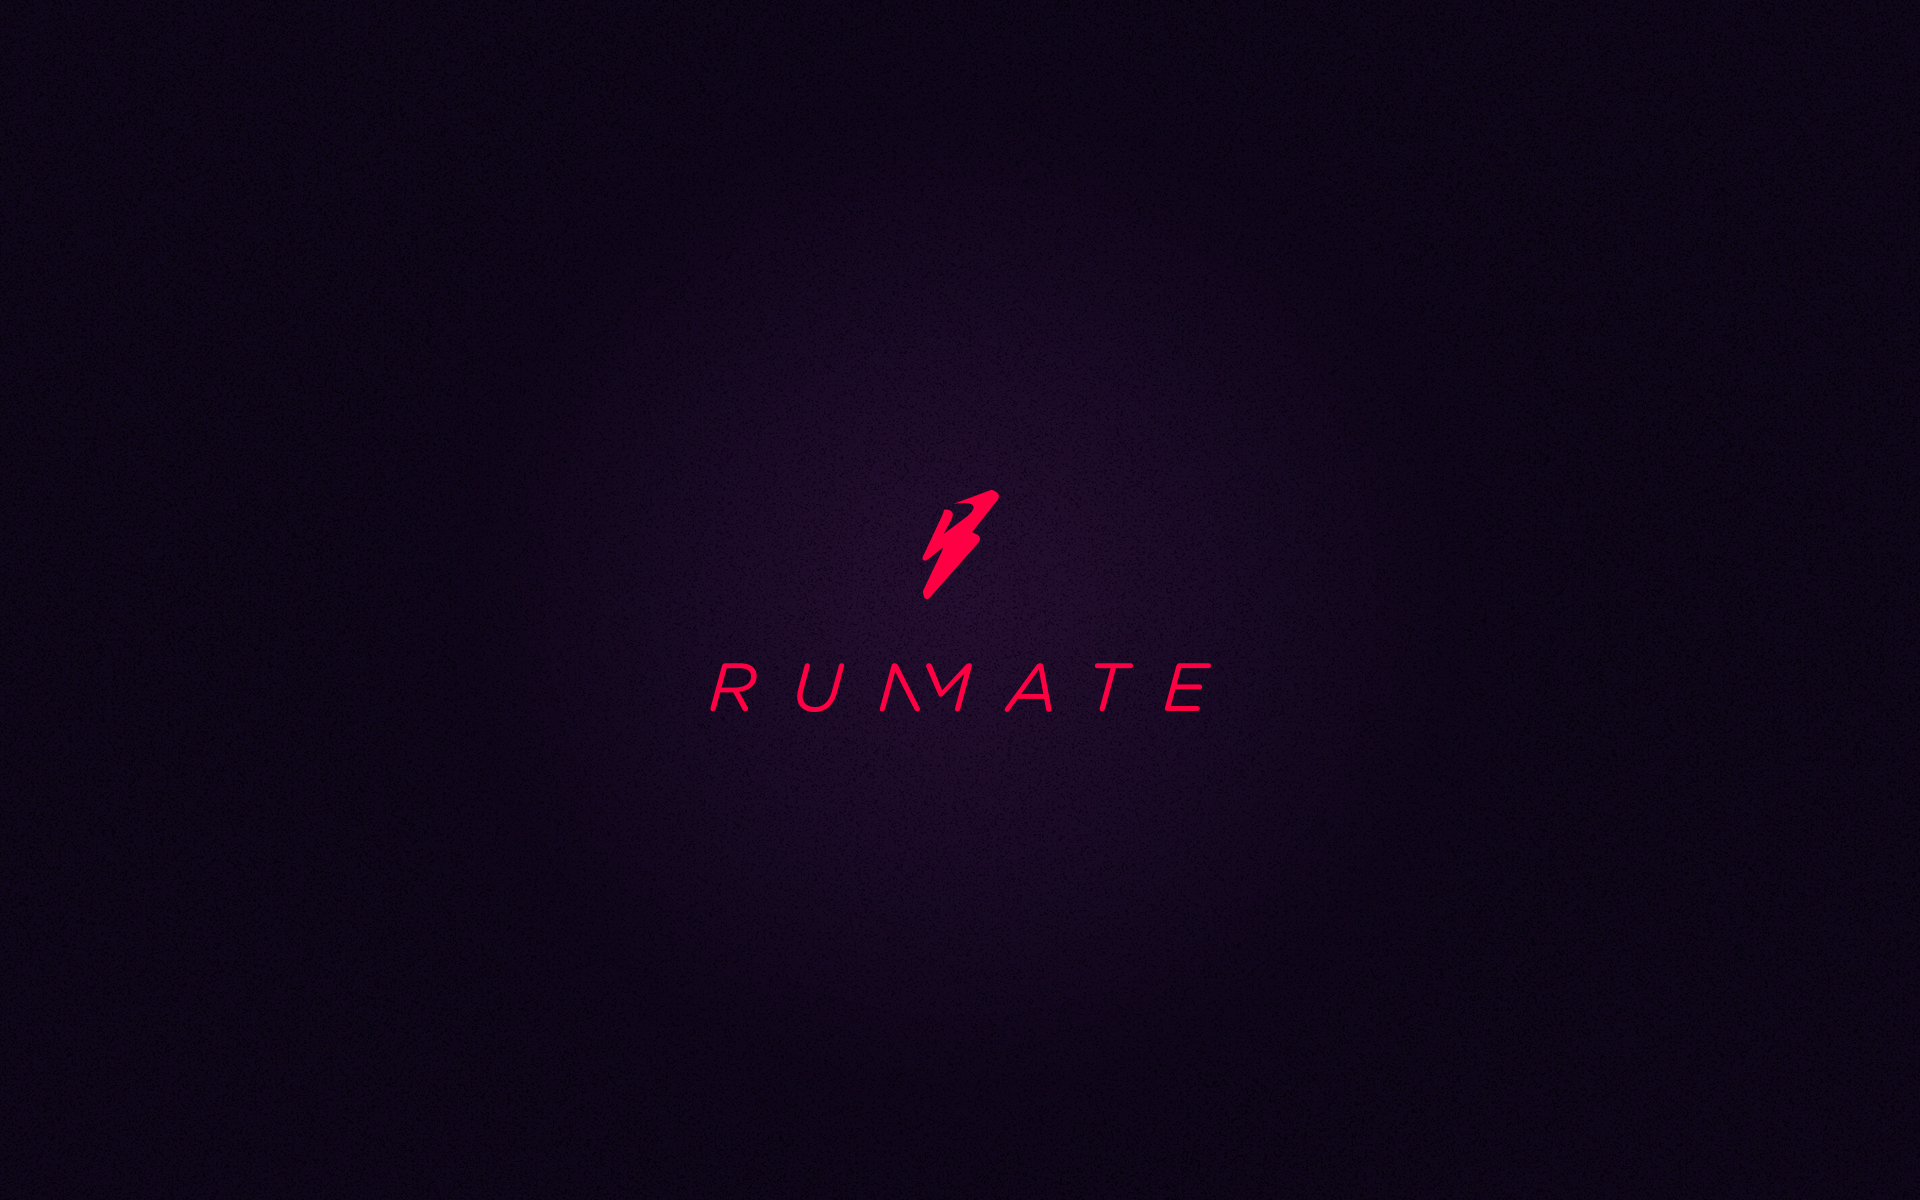 projet_logo-4runmate